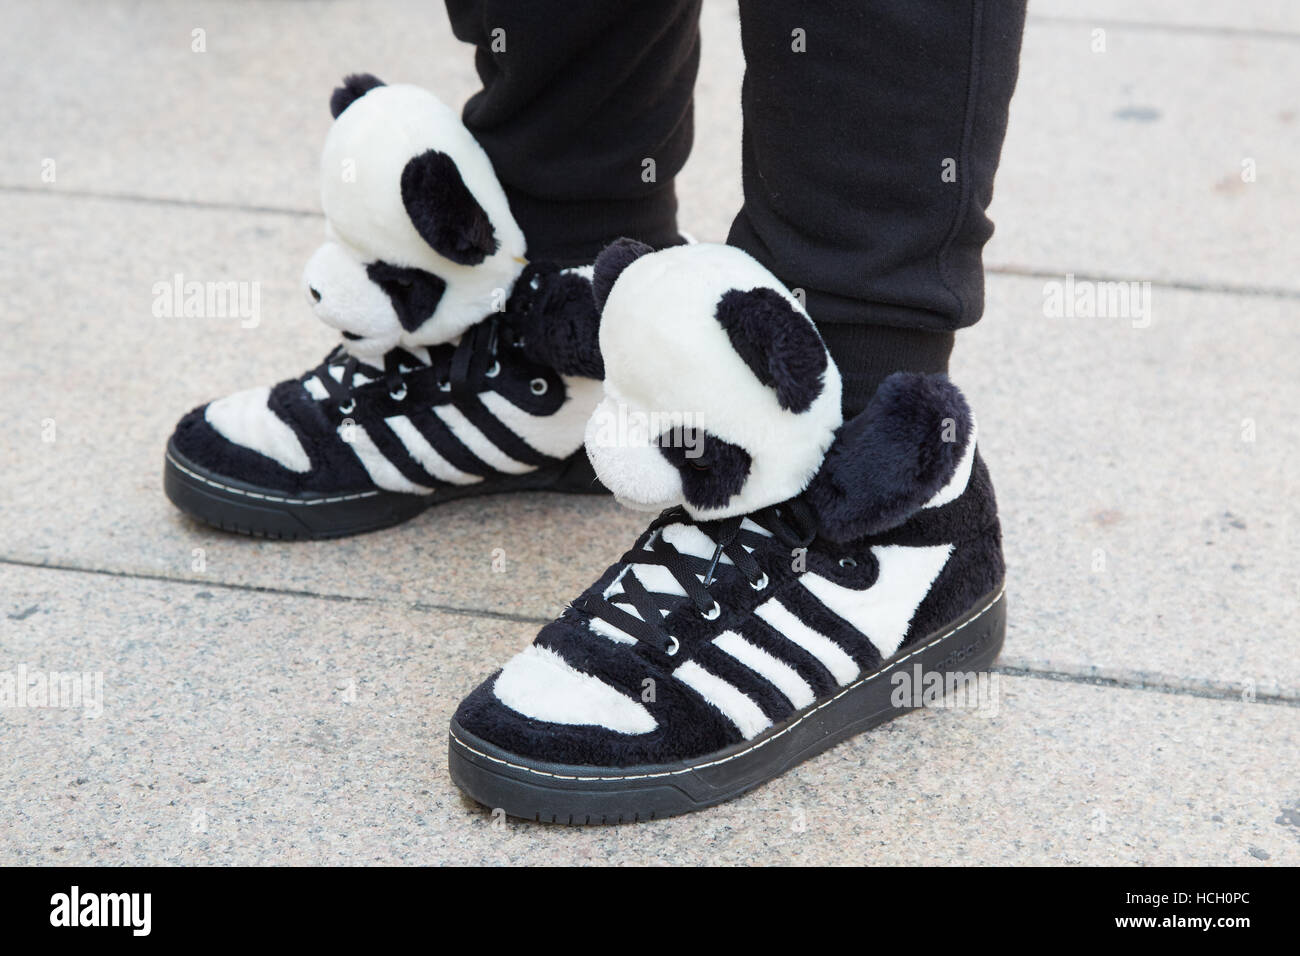 Ours Avec Homme Panda Chaussures Adidas Marionnette Cristiano Avant w1cqa